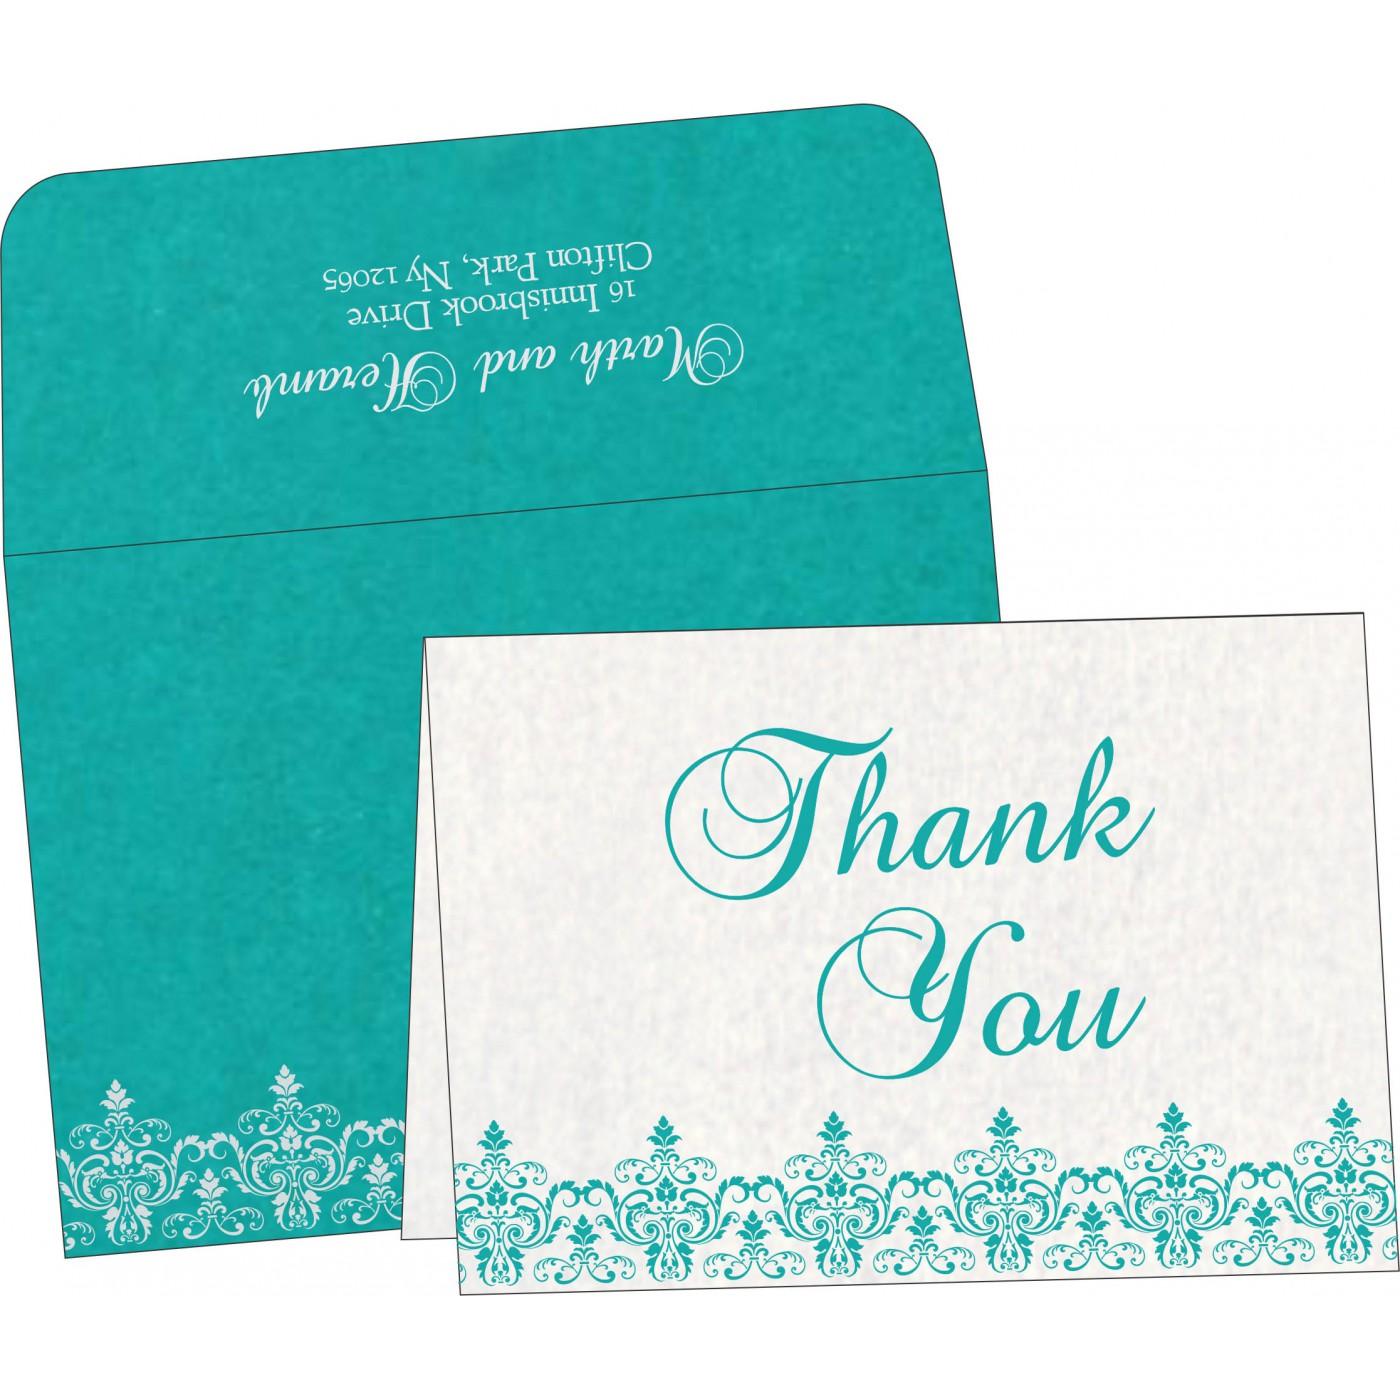 Thank You Cards : TYC-8244C - 123WeddingCards